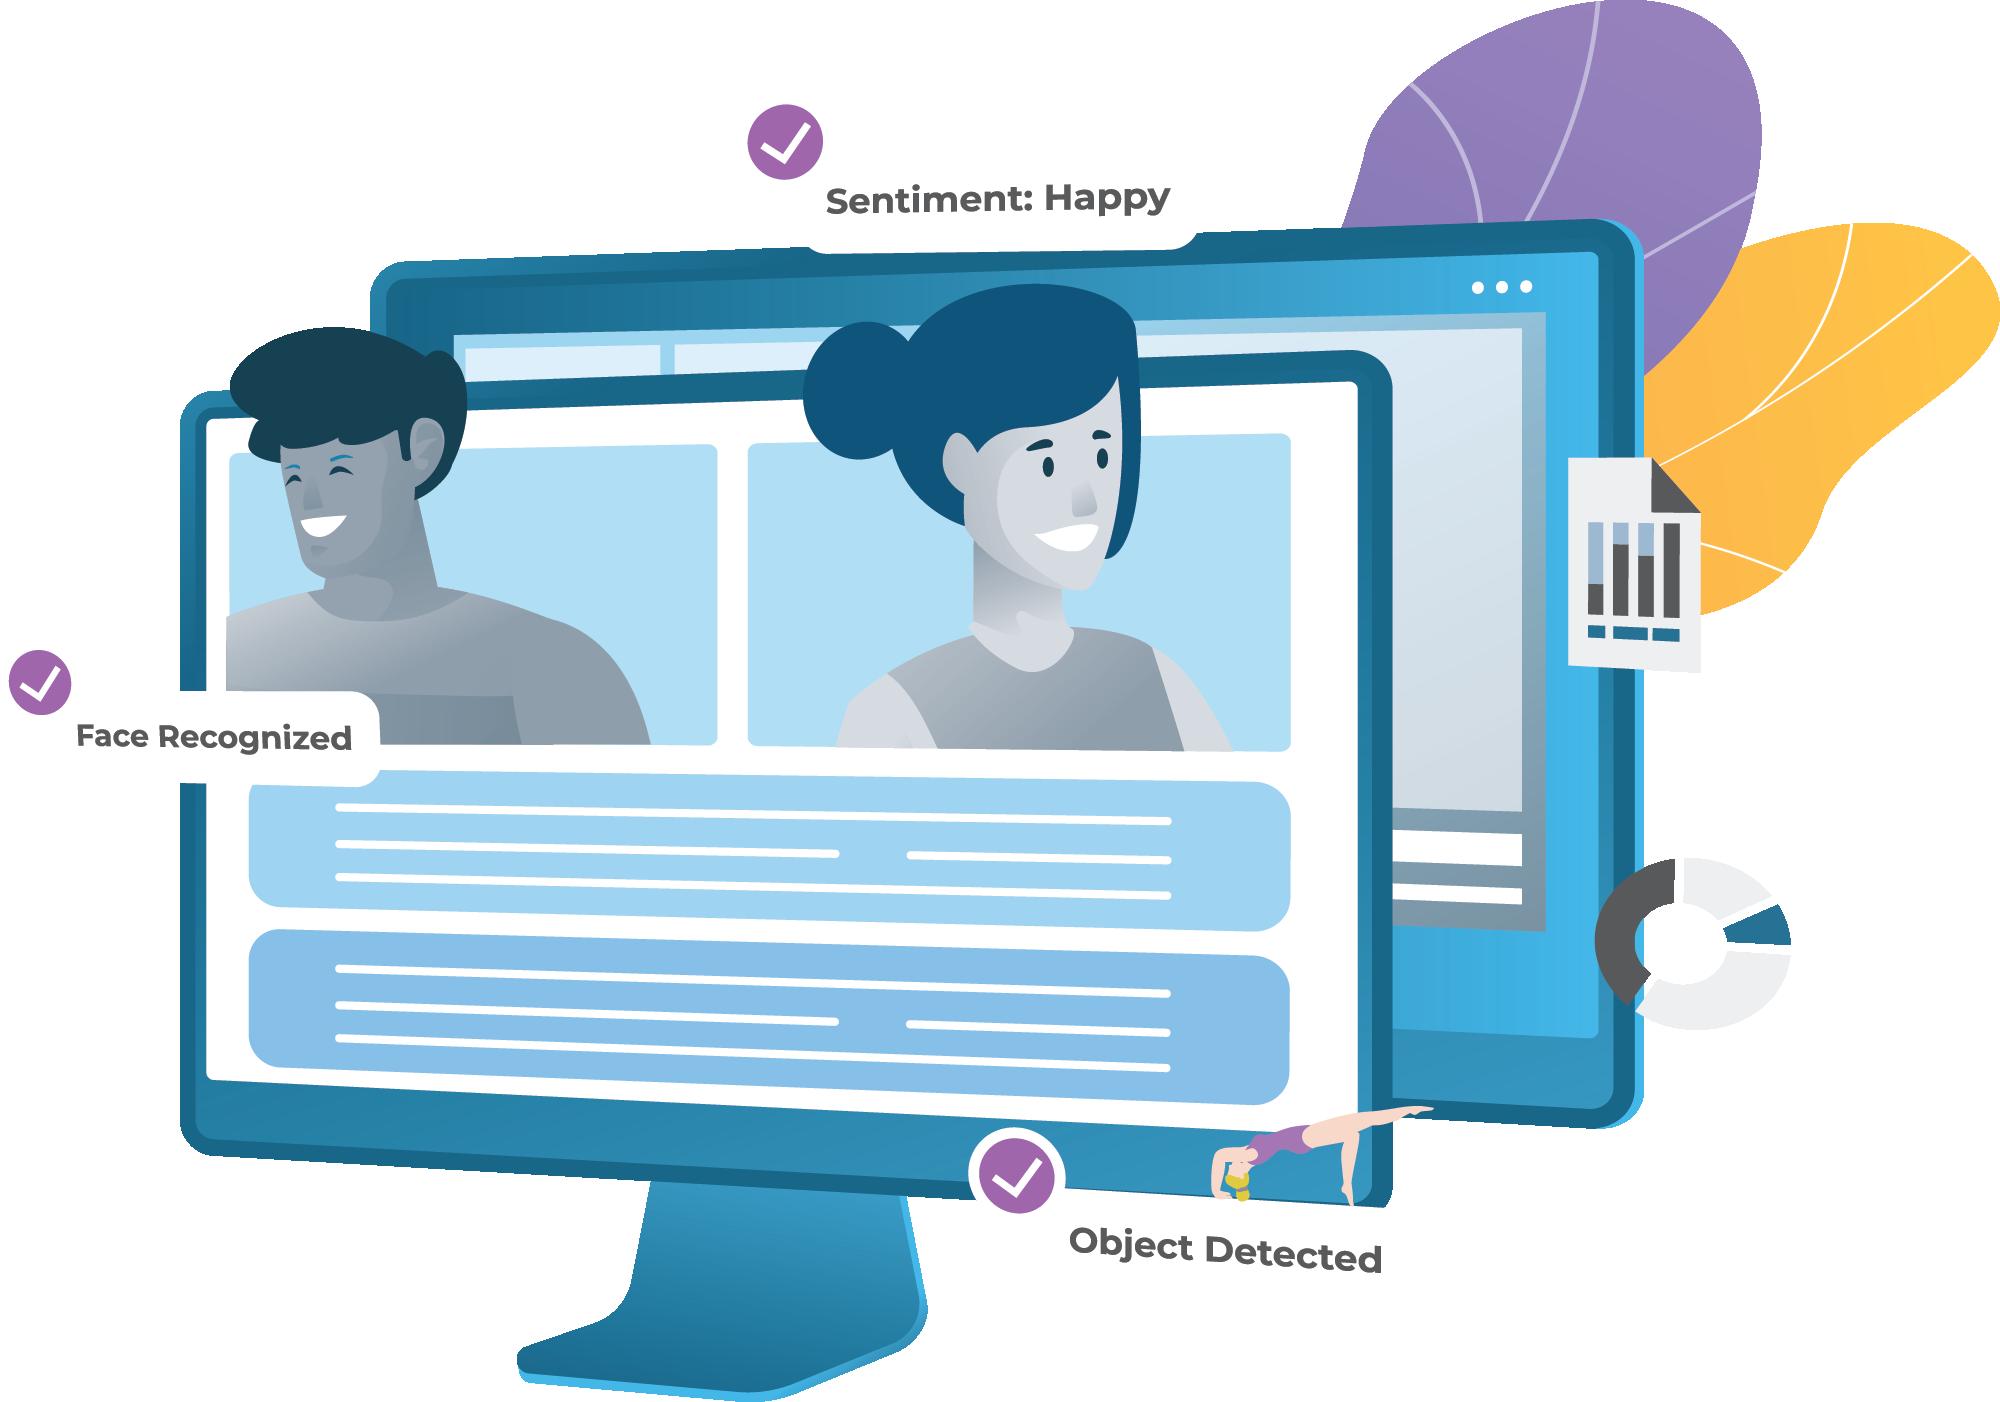 WebRTC Video Platform with AI Capabilities